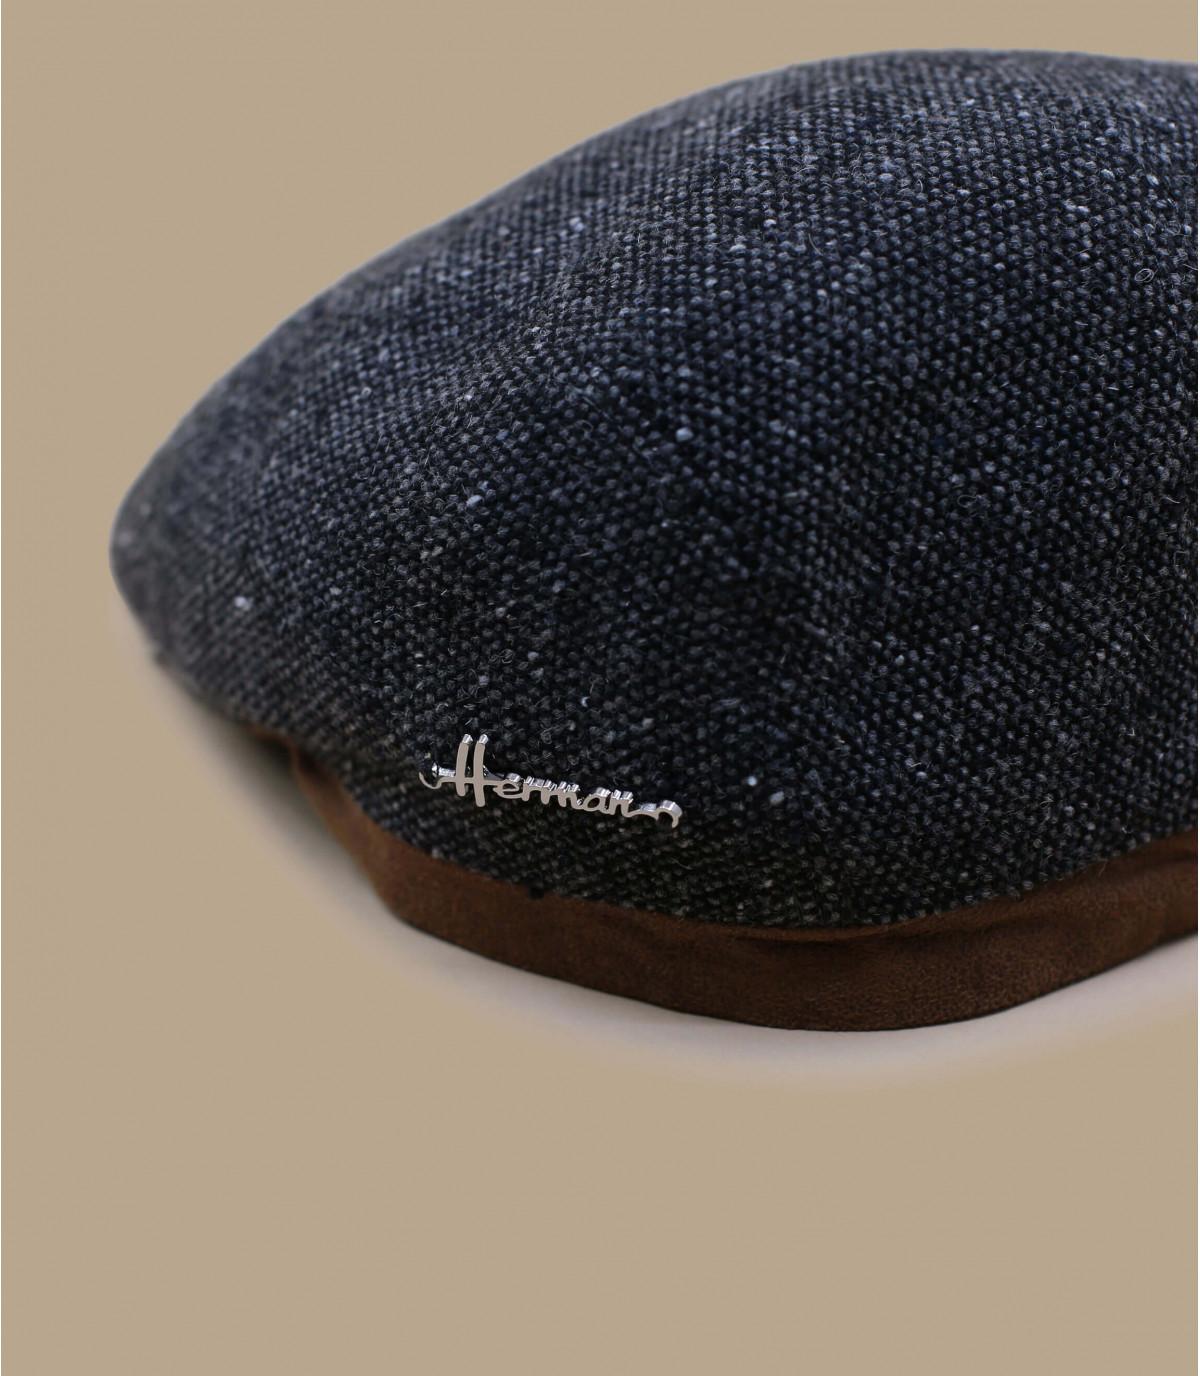 Dettagli Range Wool charcoal - image 2